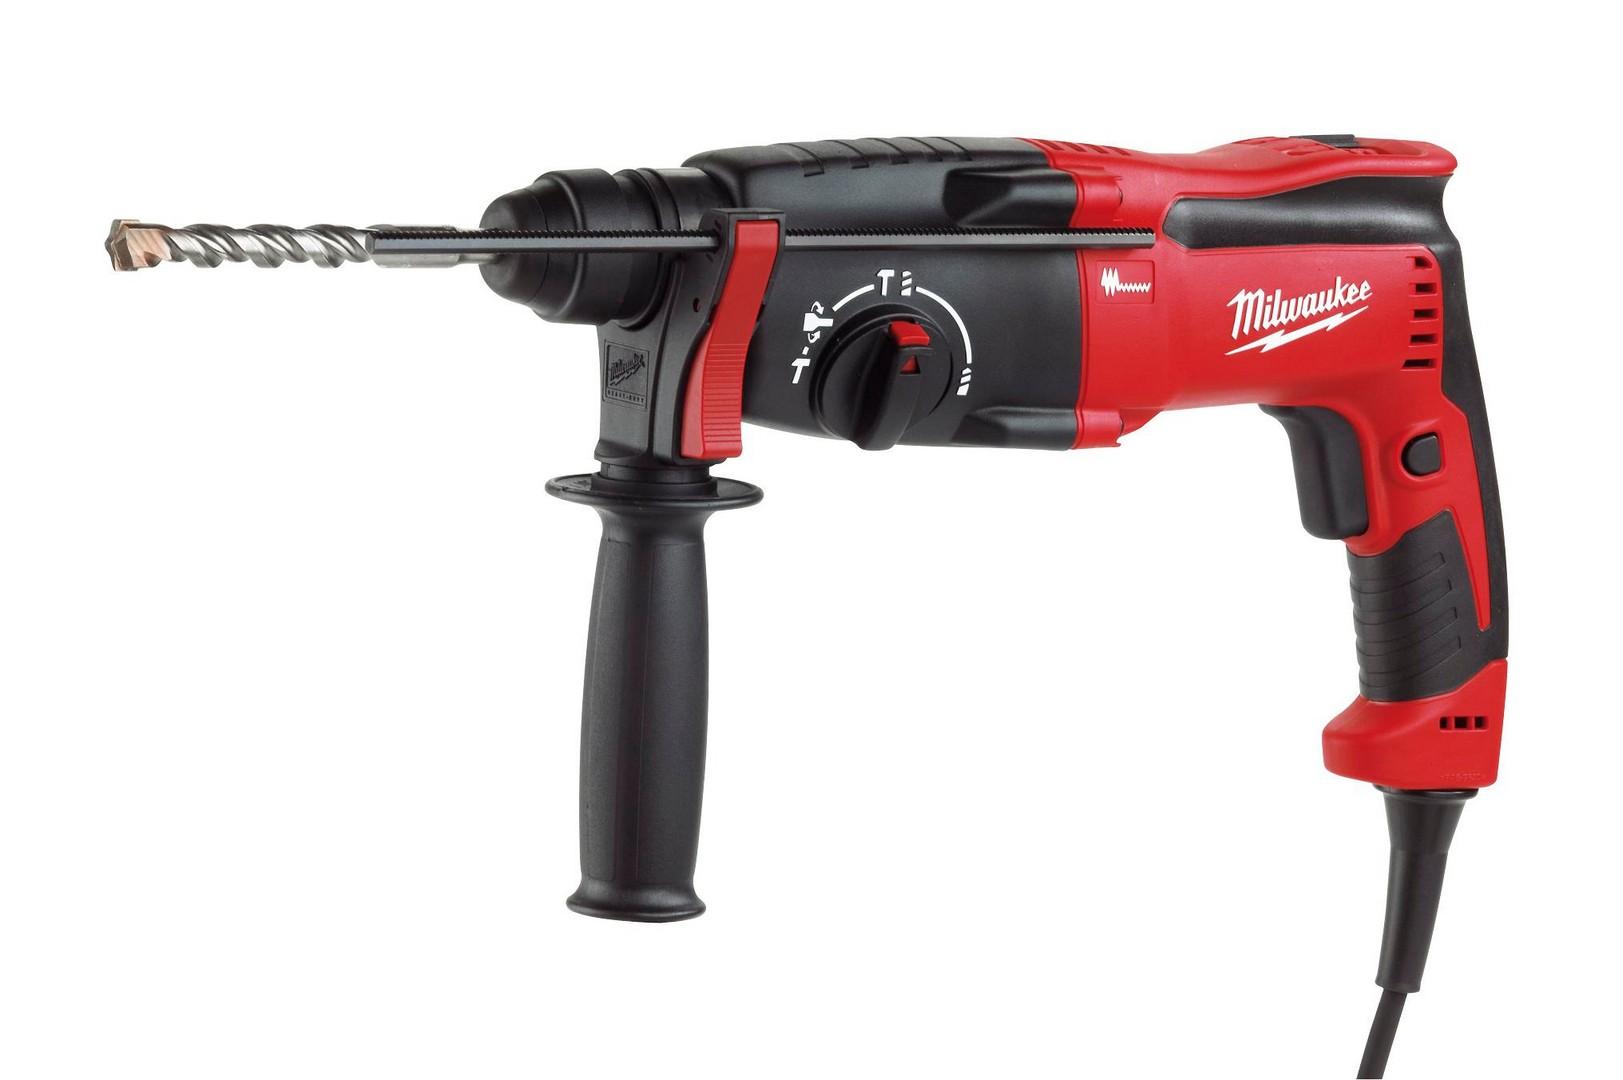 Milwaukee PH28 SDS+ Hammer Drill